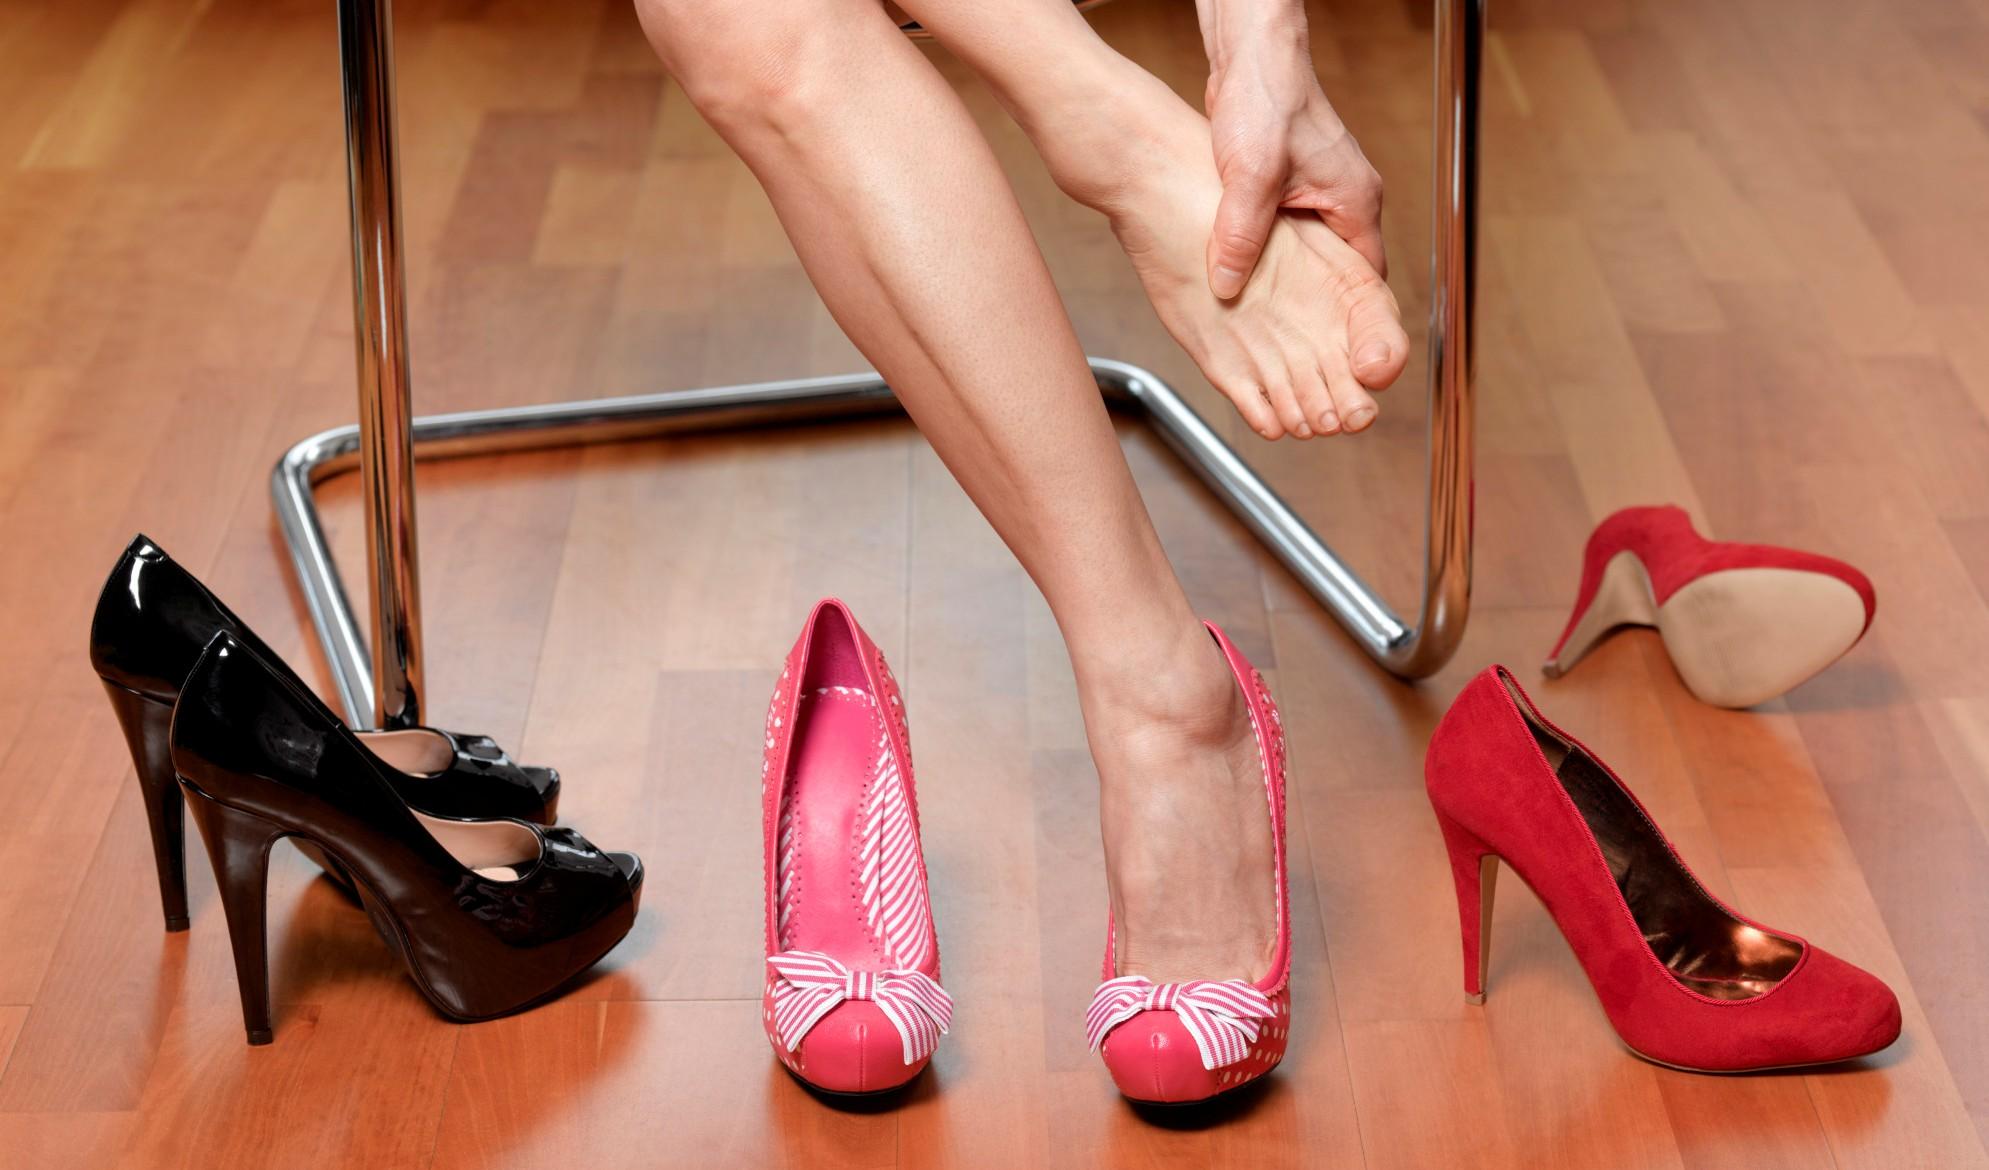 memakai high heels